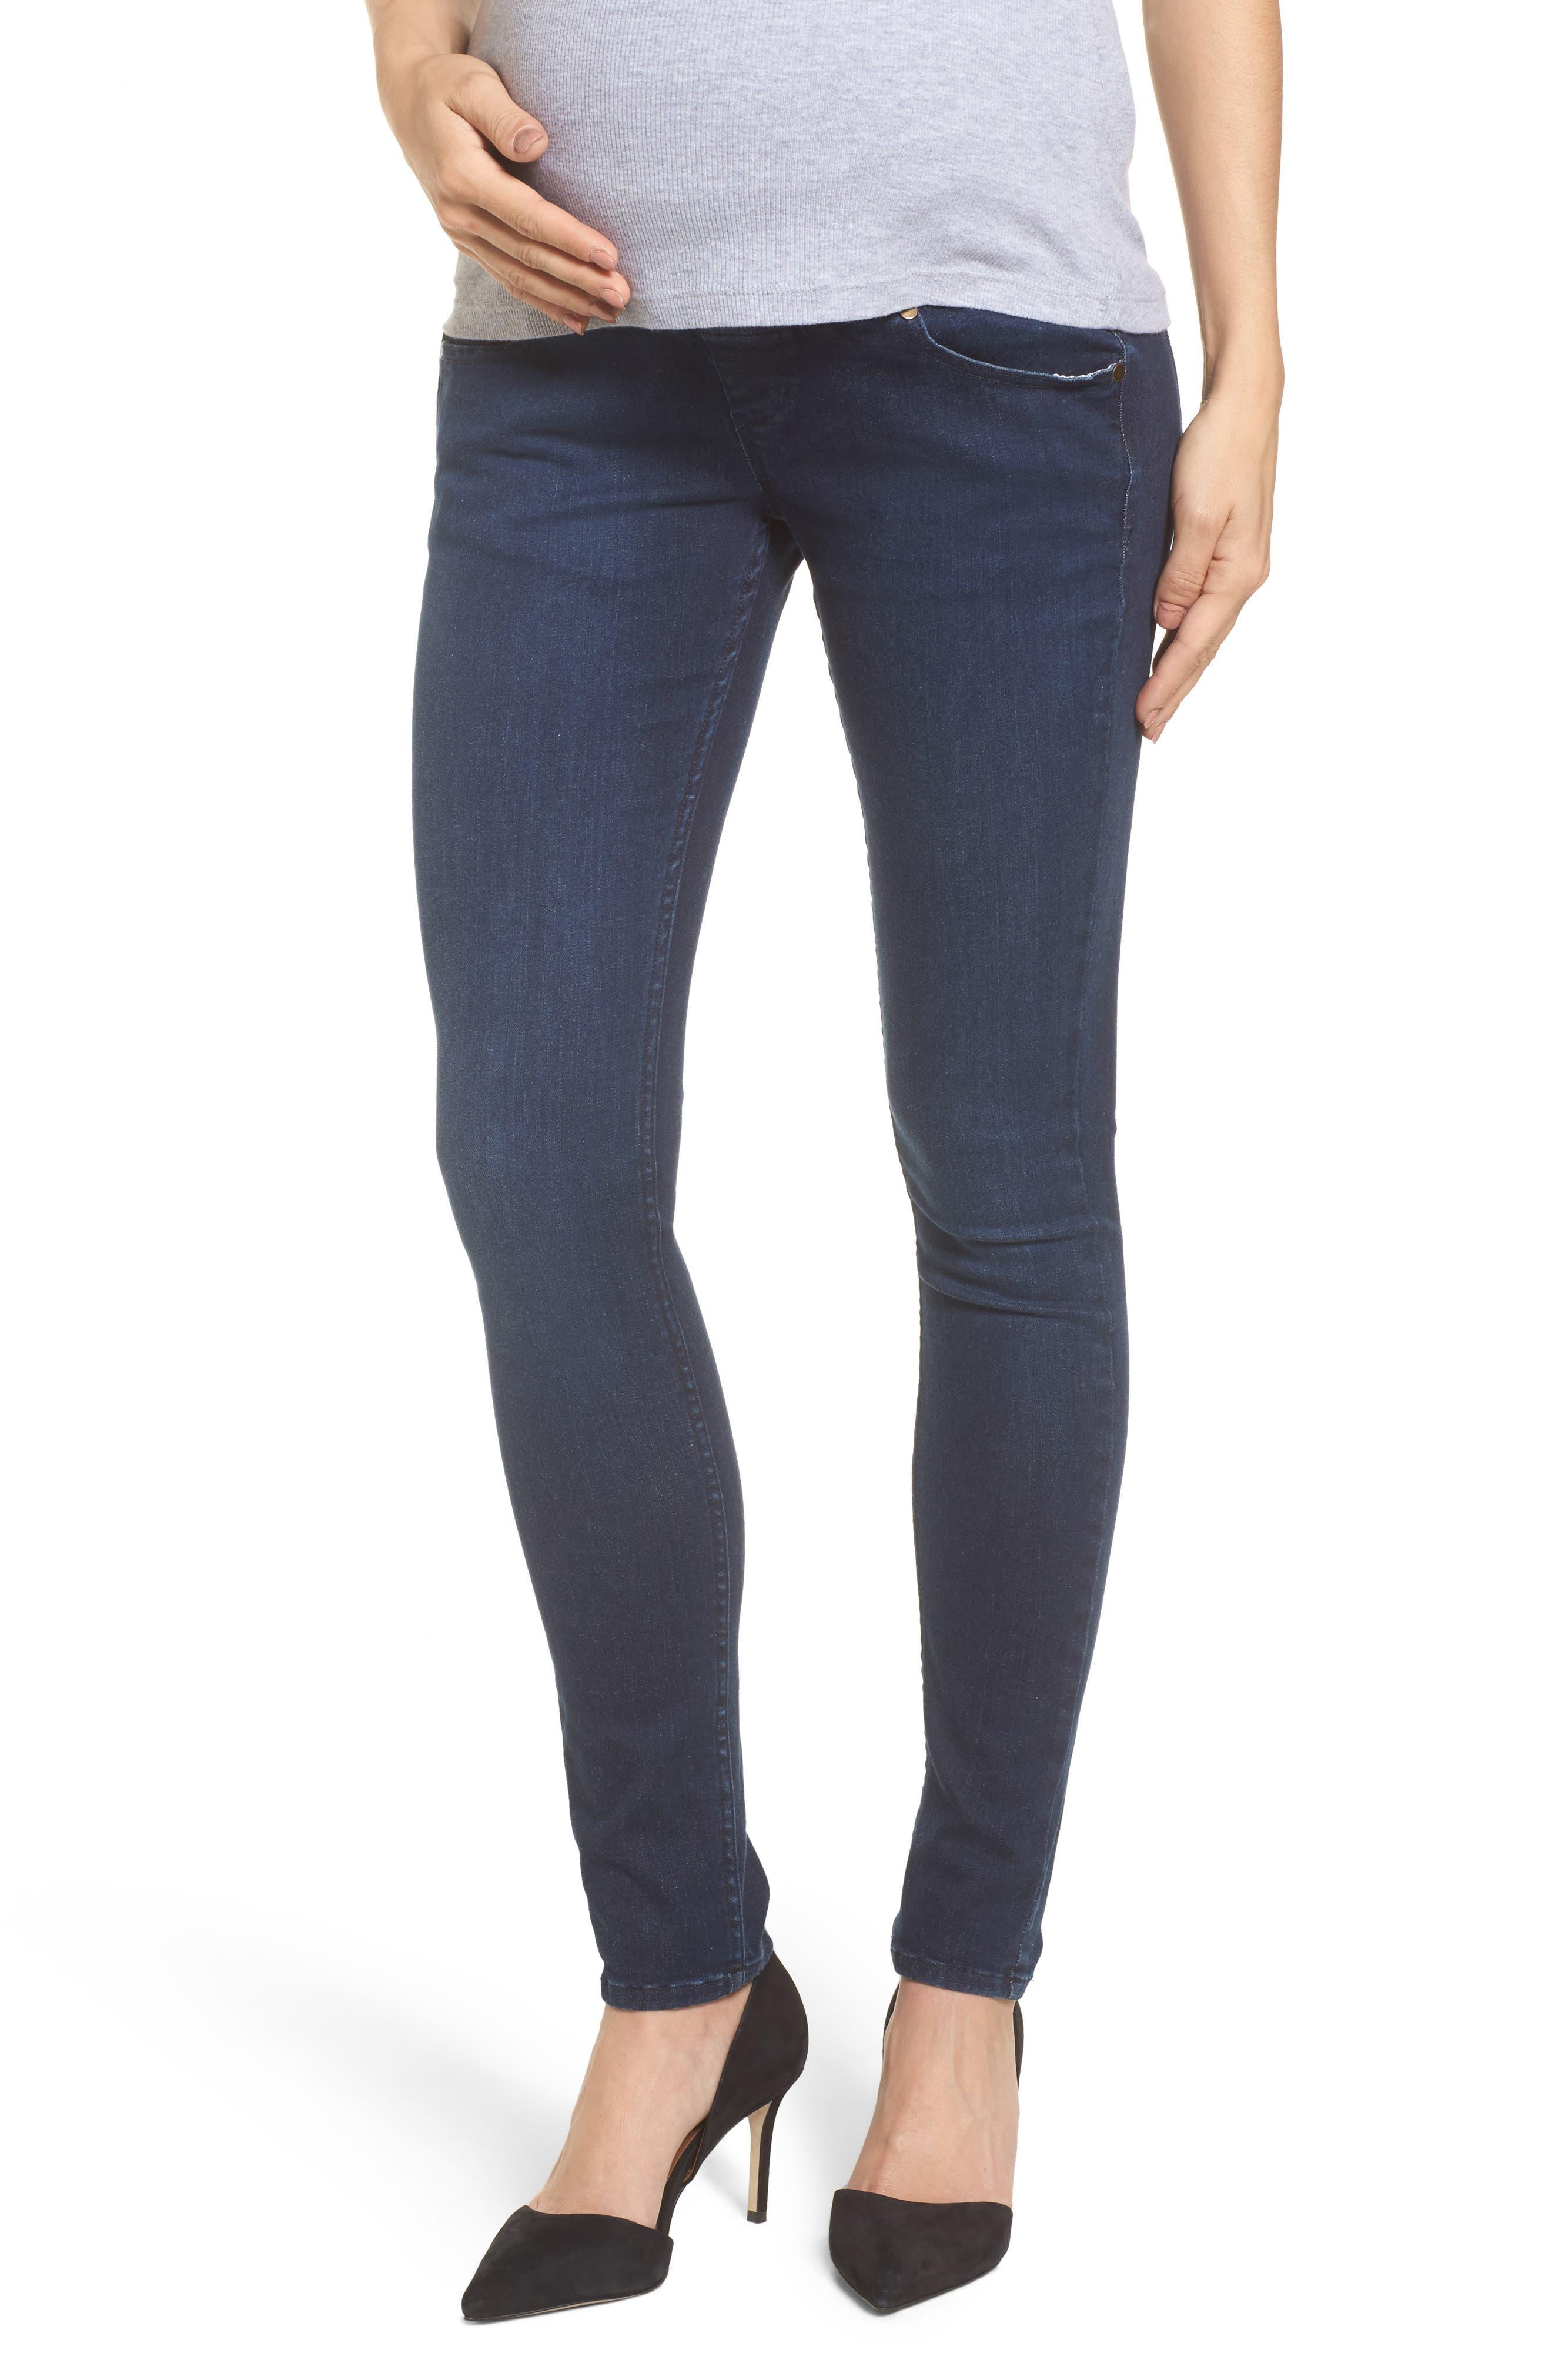 Super Stretch Maternity Skinny Jeans,                             Main thumbnail 1, color,                             Indigo